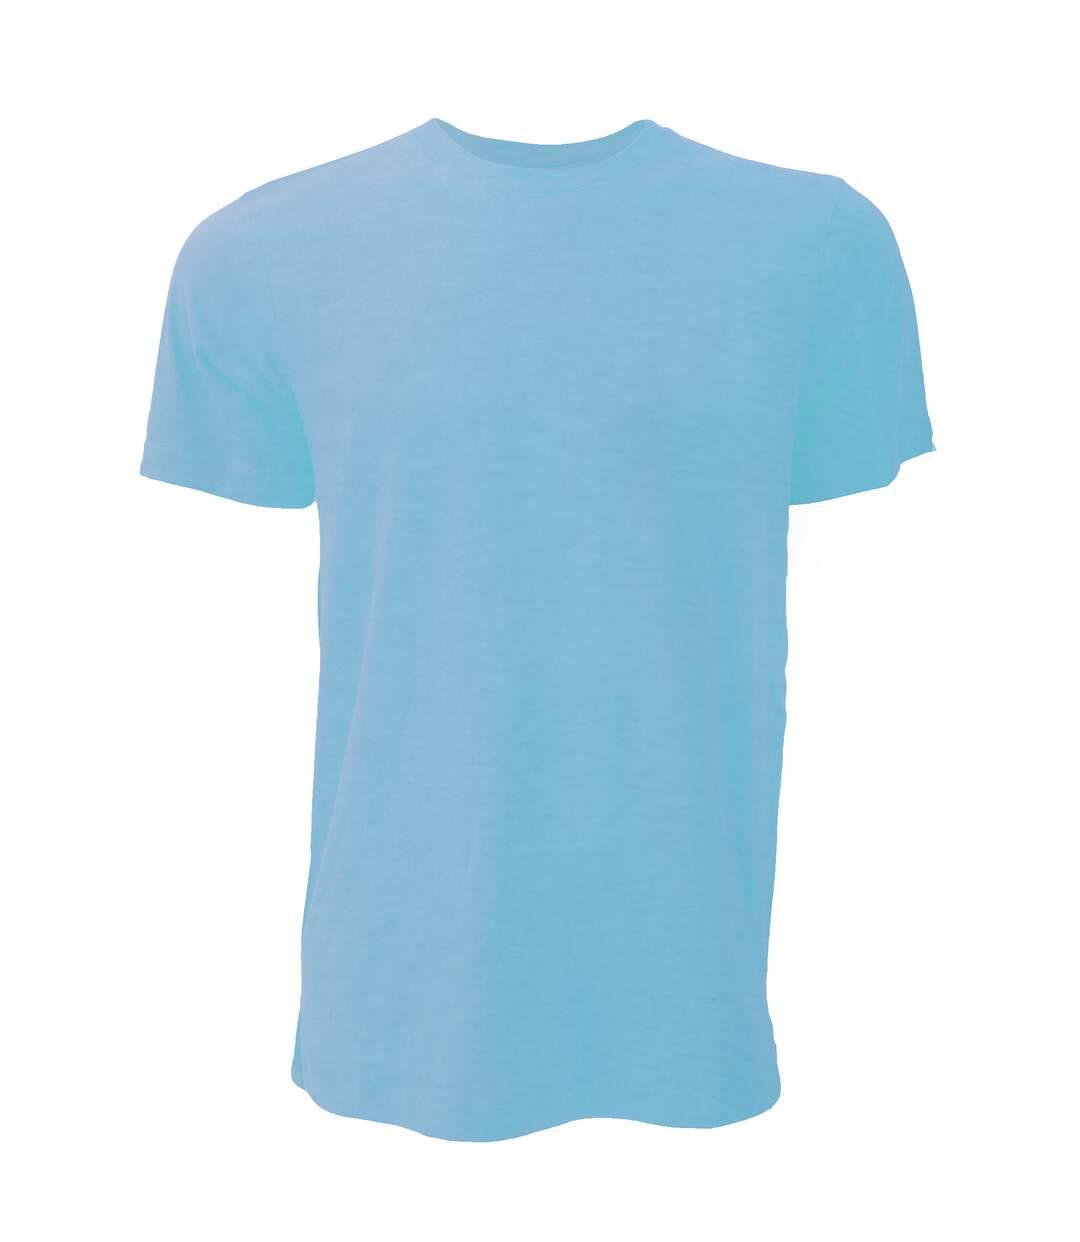 Canvas Unisex Jersey Crew Neck T-Shirt / Mens Short Sleeve T-Shirt (Heather Mint) - UTBC163